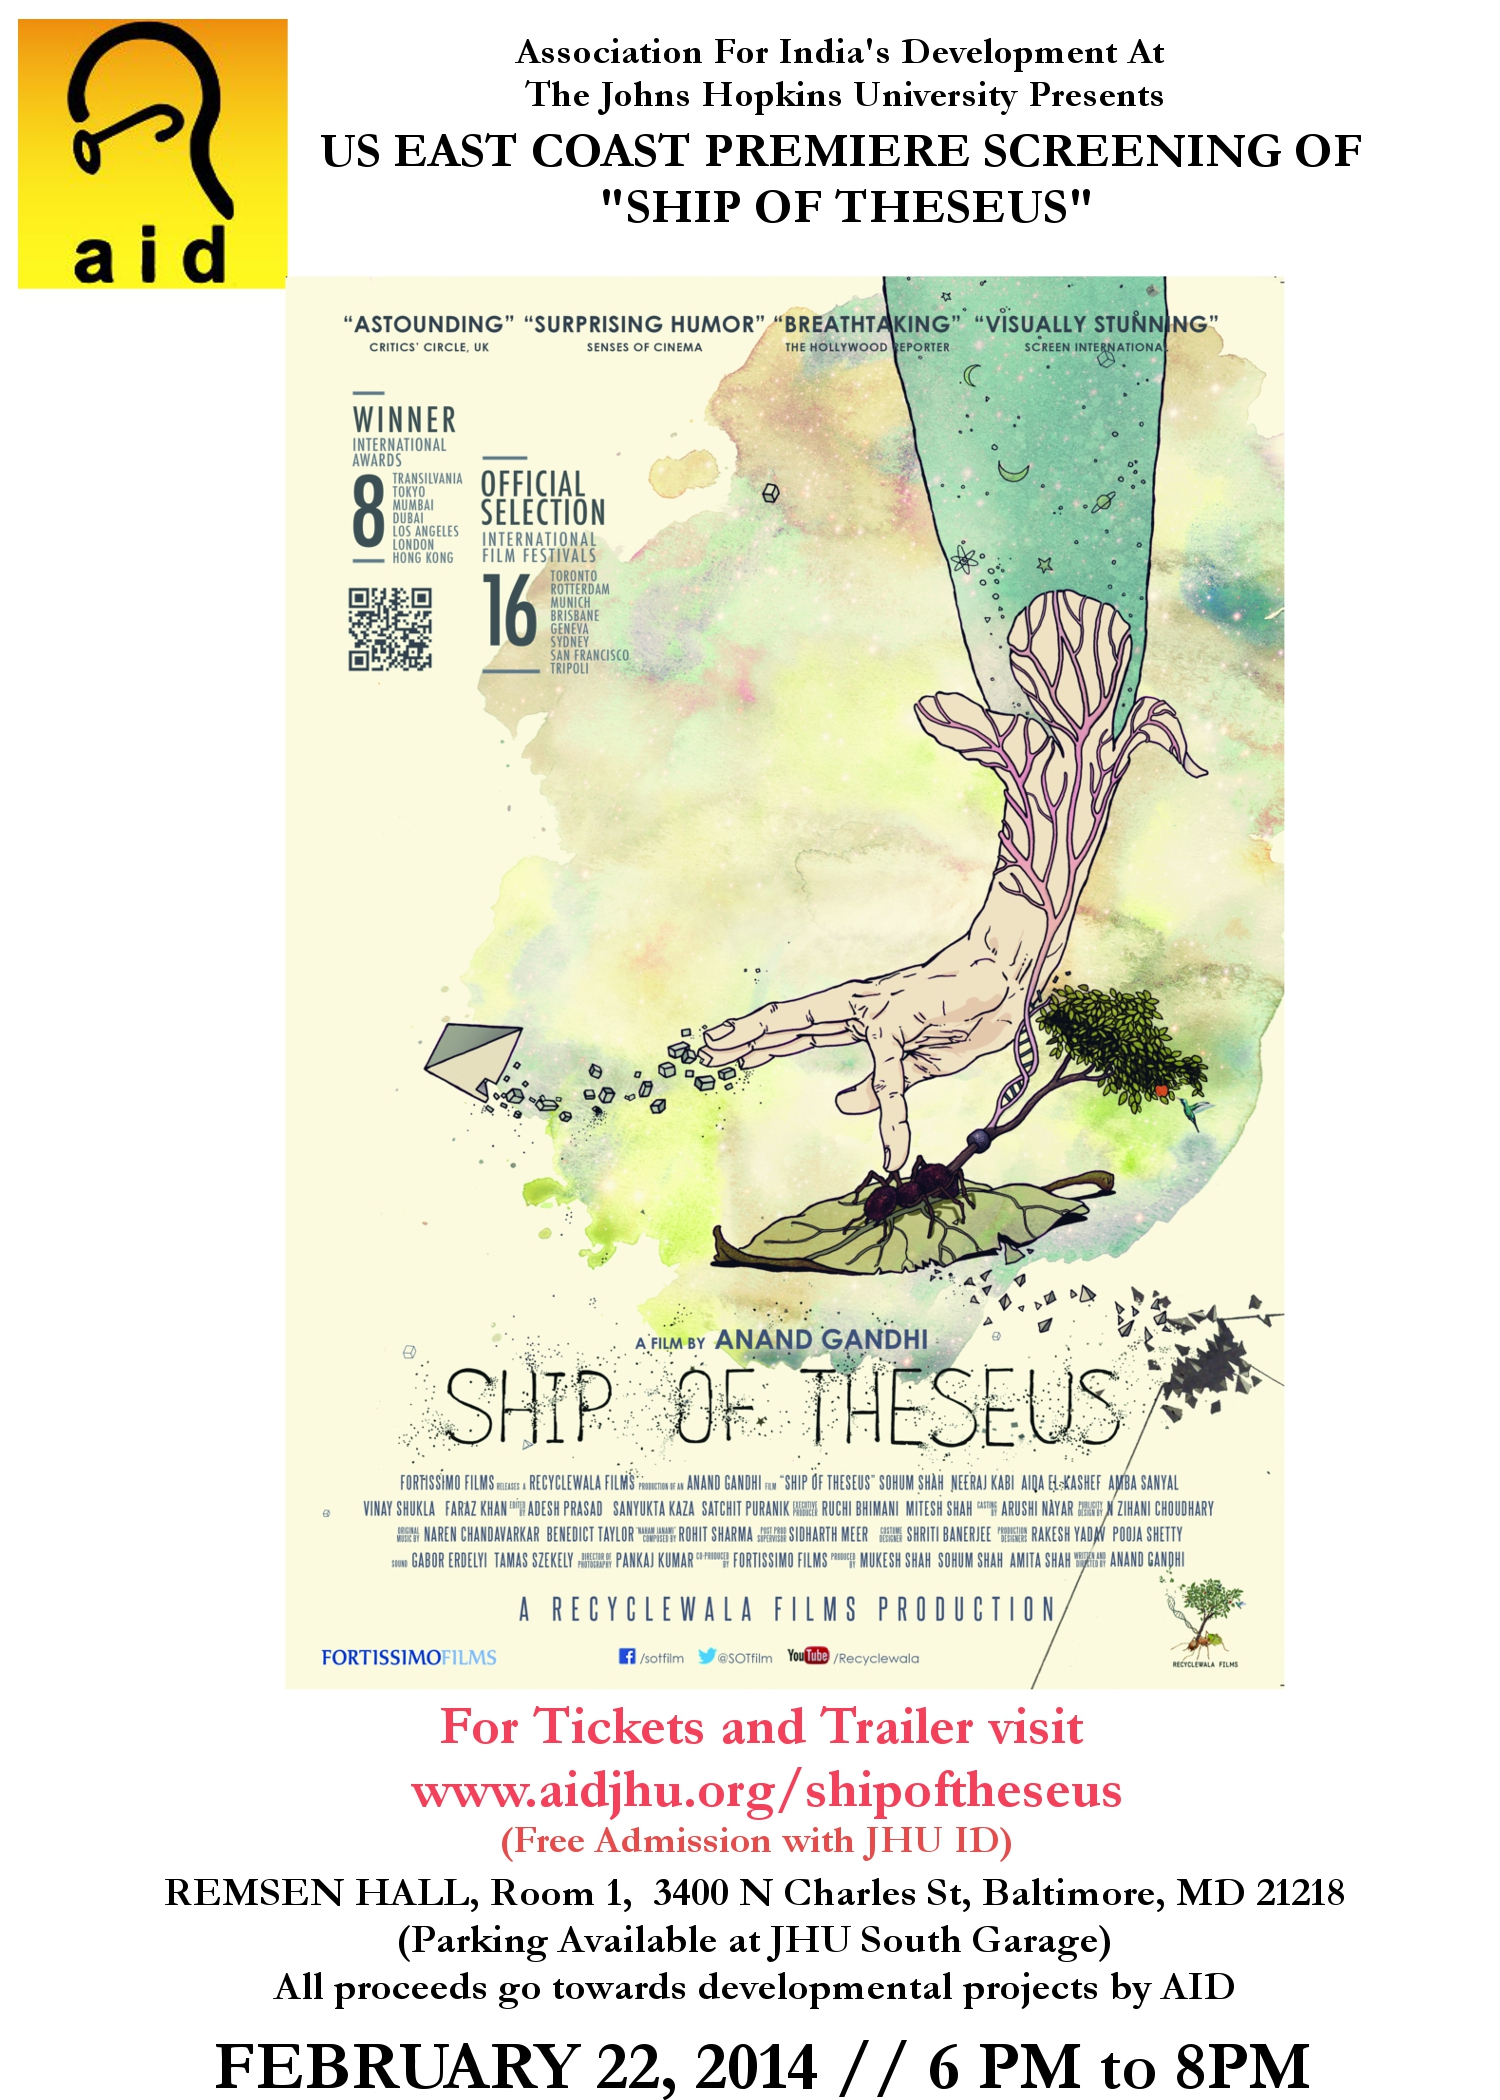 ship_of_theseus_3.jpeg